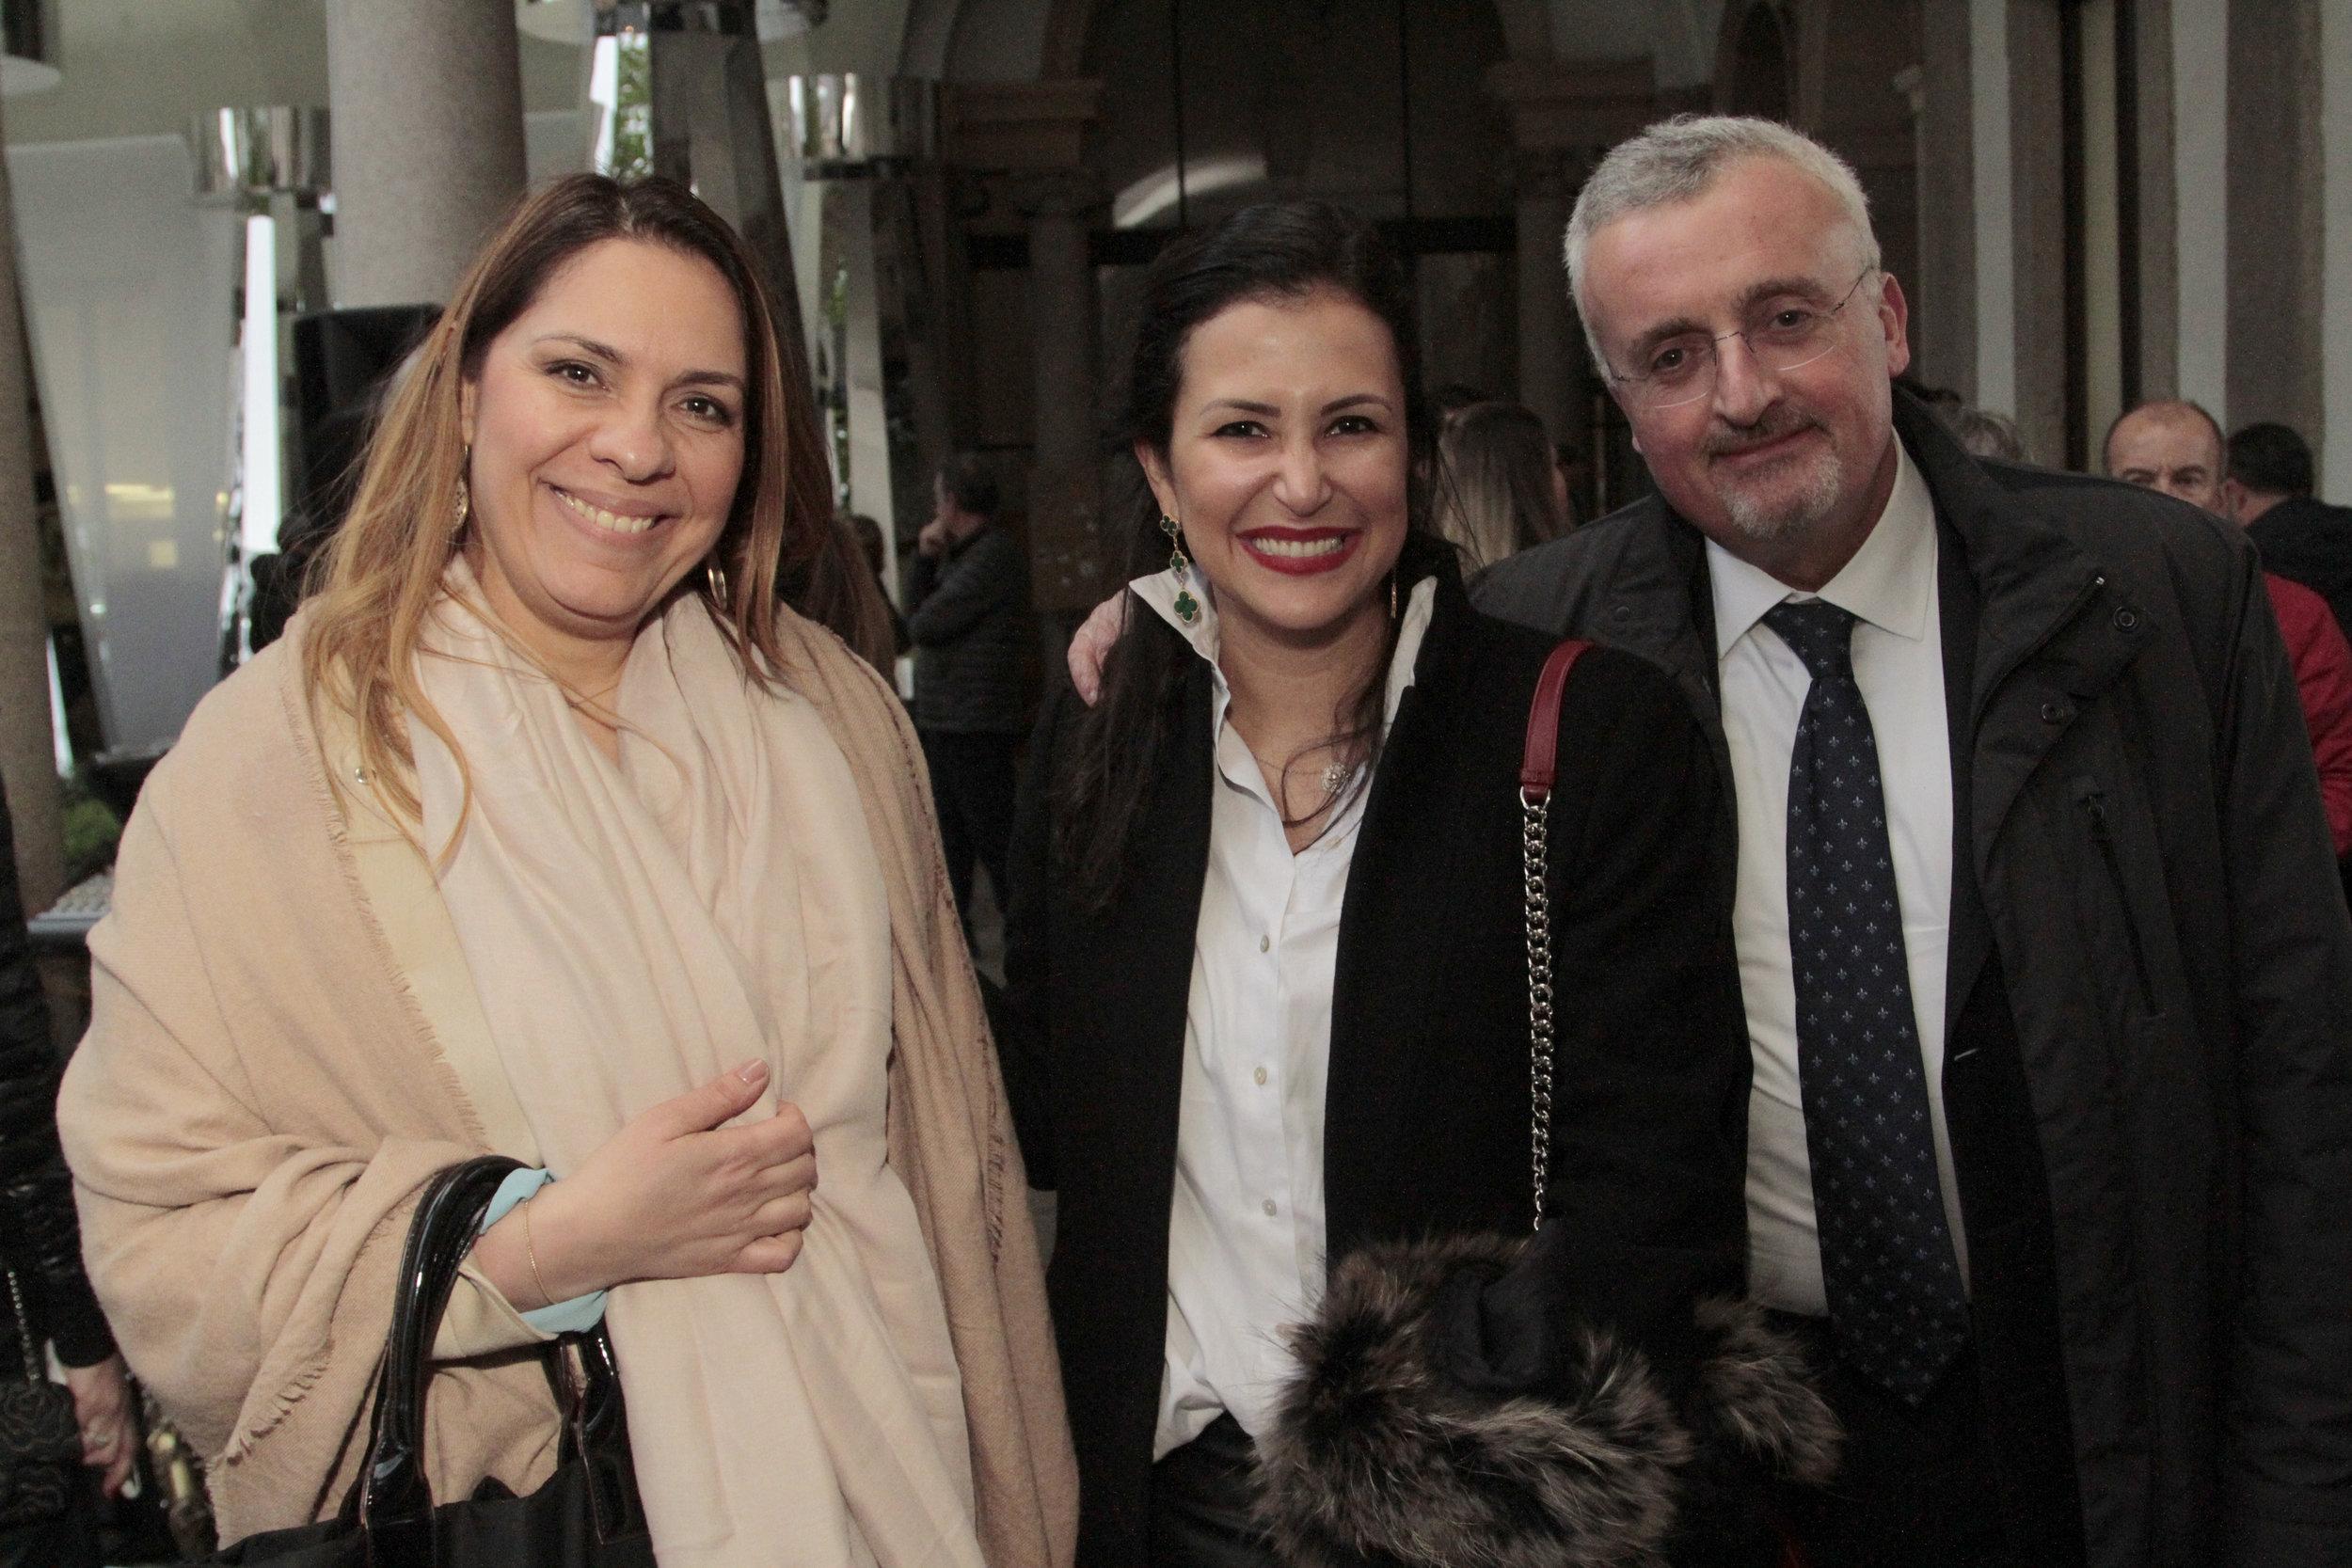 Marilia Mello, Vivian Coser e Silvio Gori